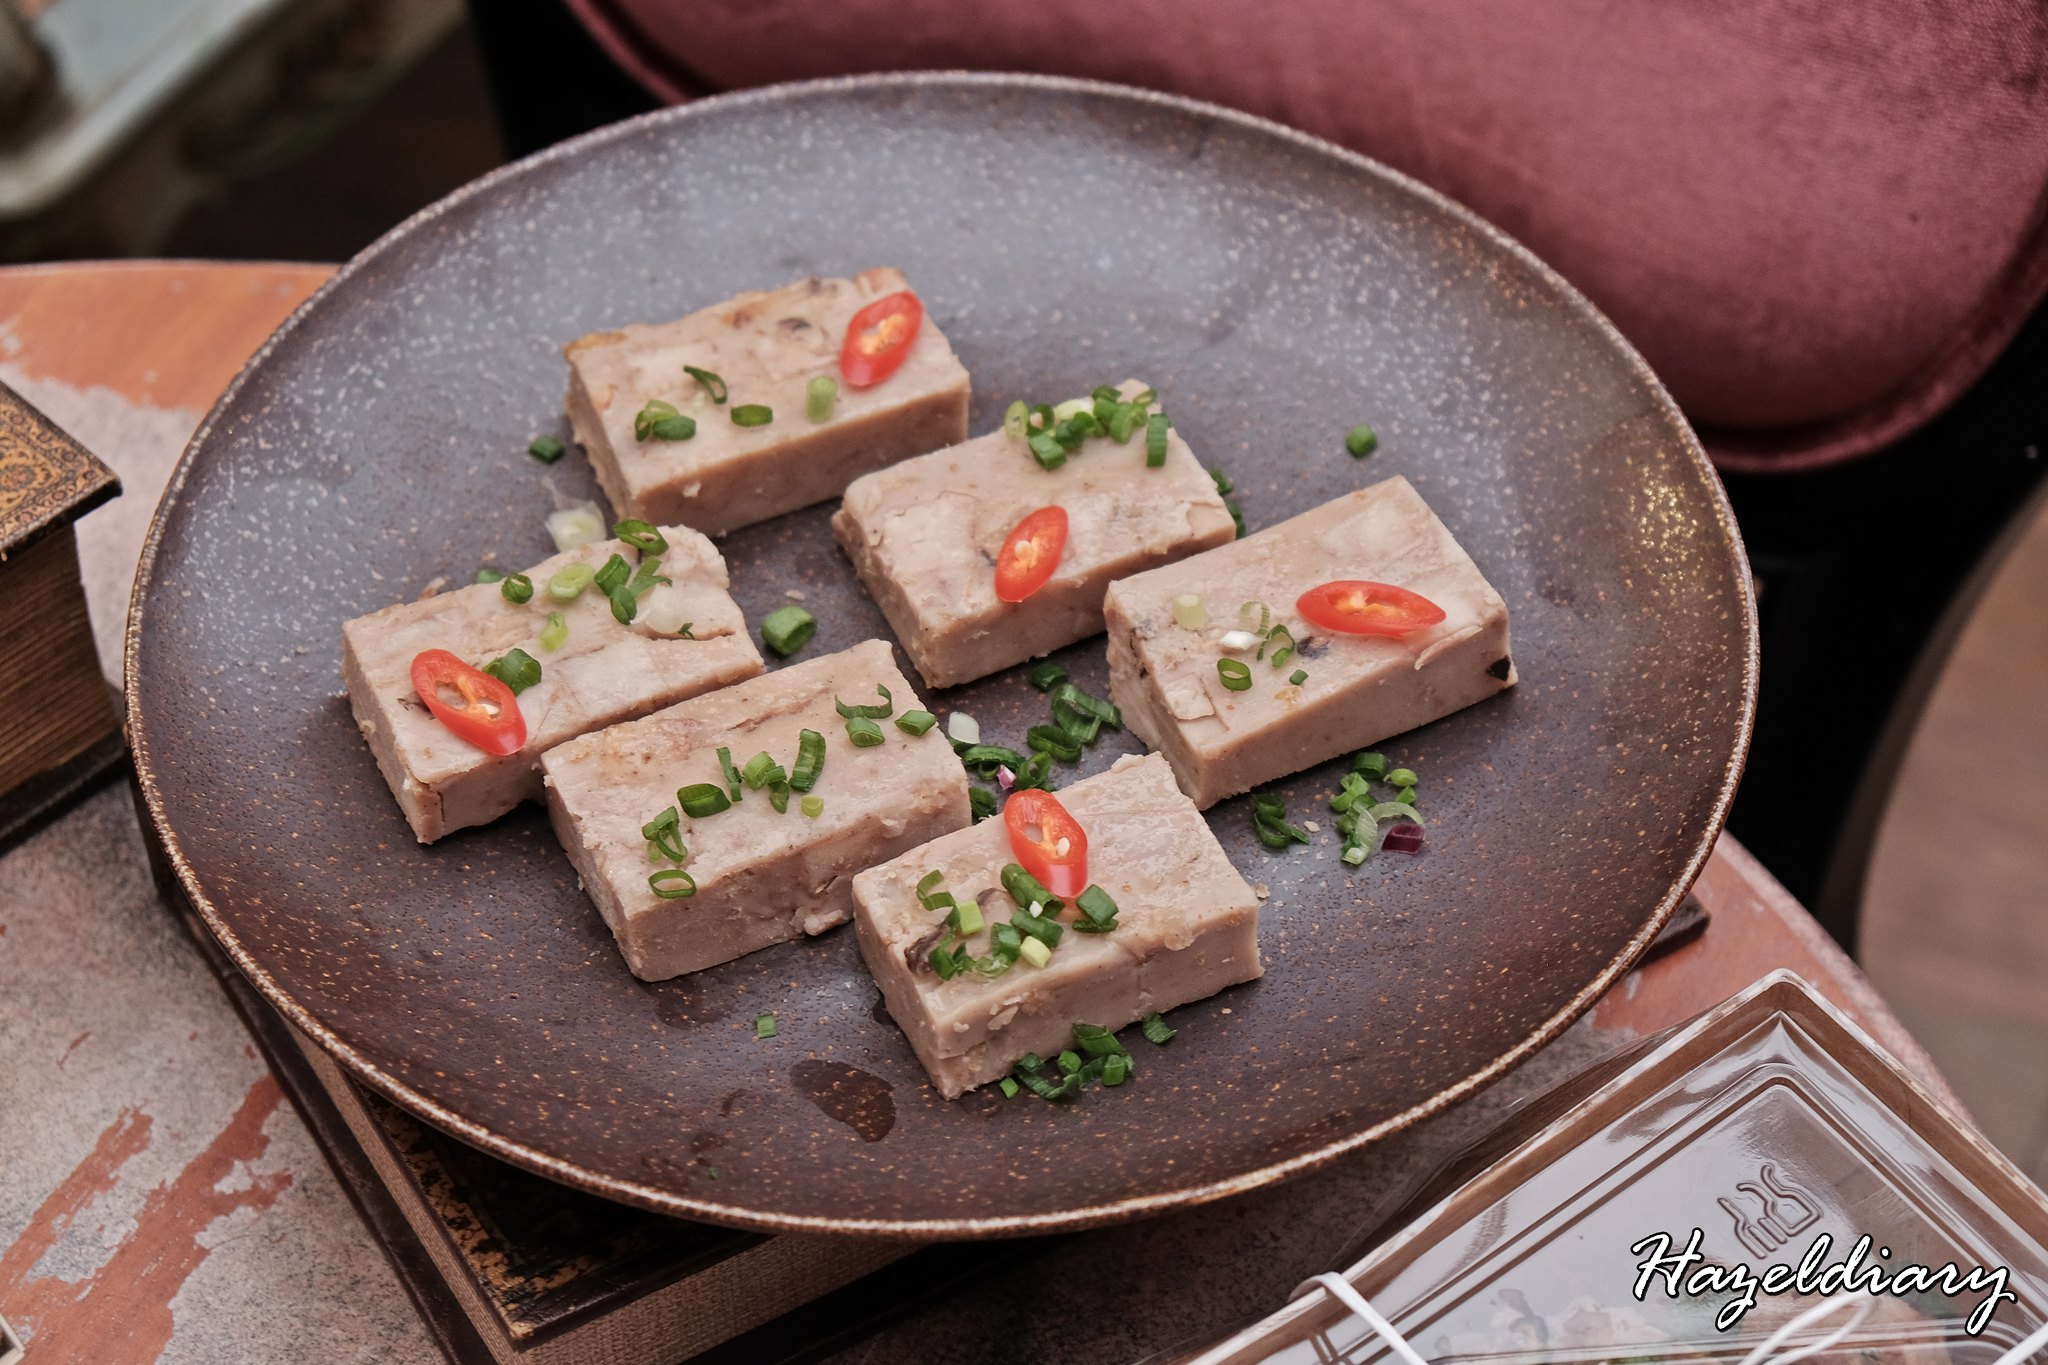 Pang Hakka Delicacies- Hakka Yam Cake